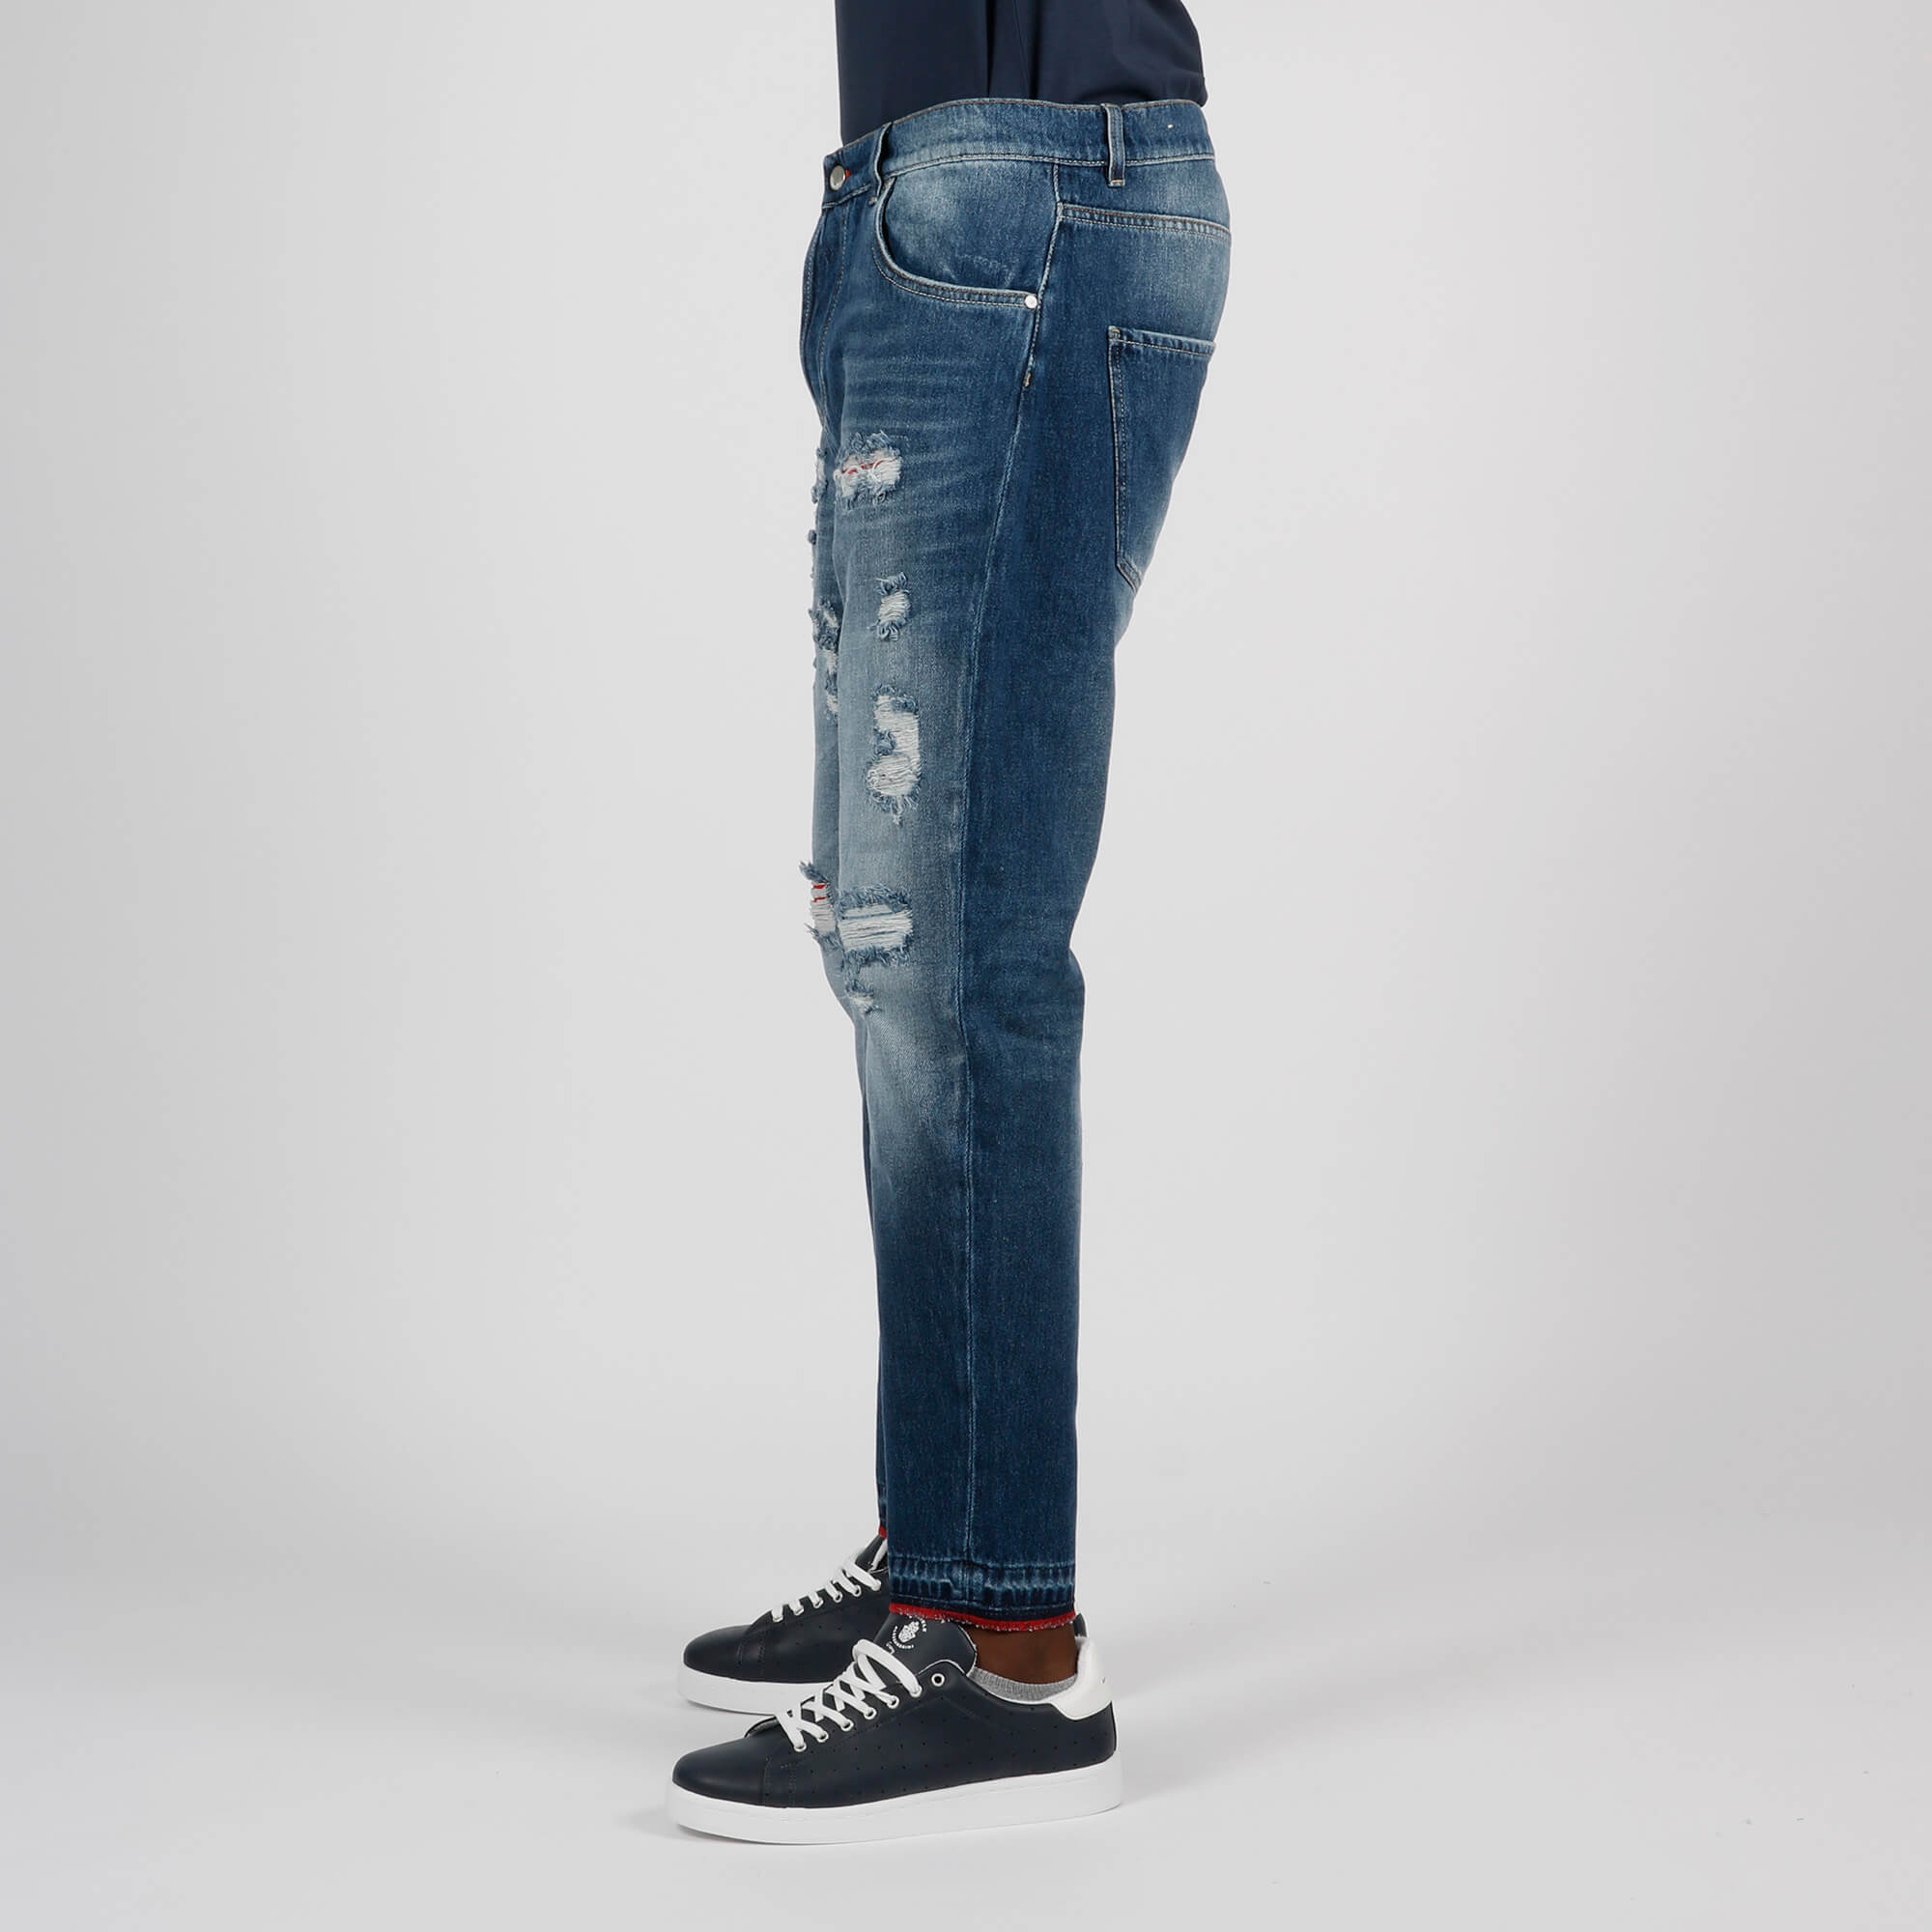 Jeans renato strappi - Denim